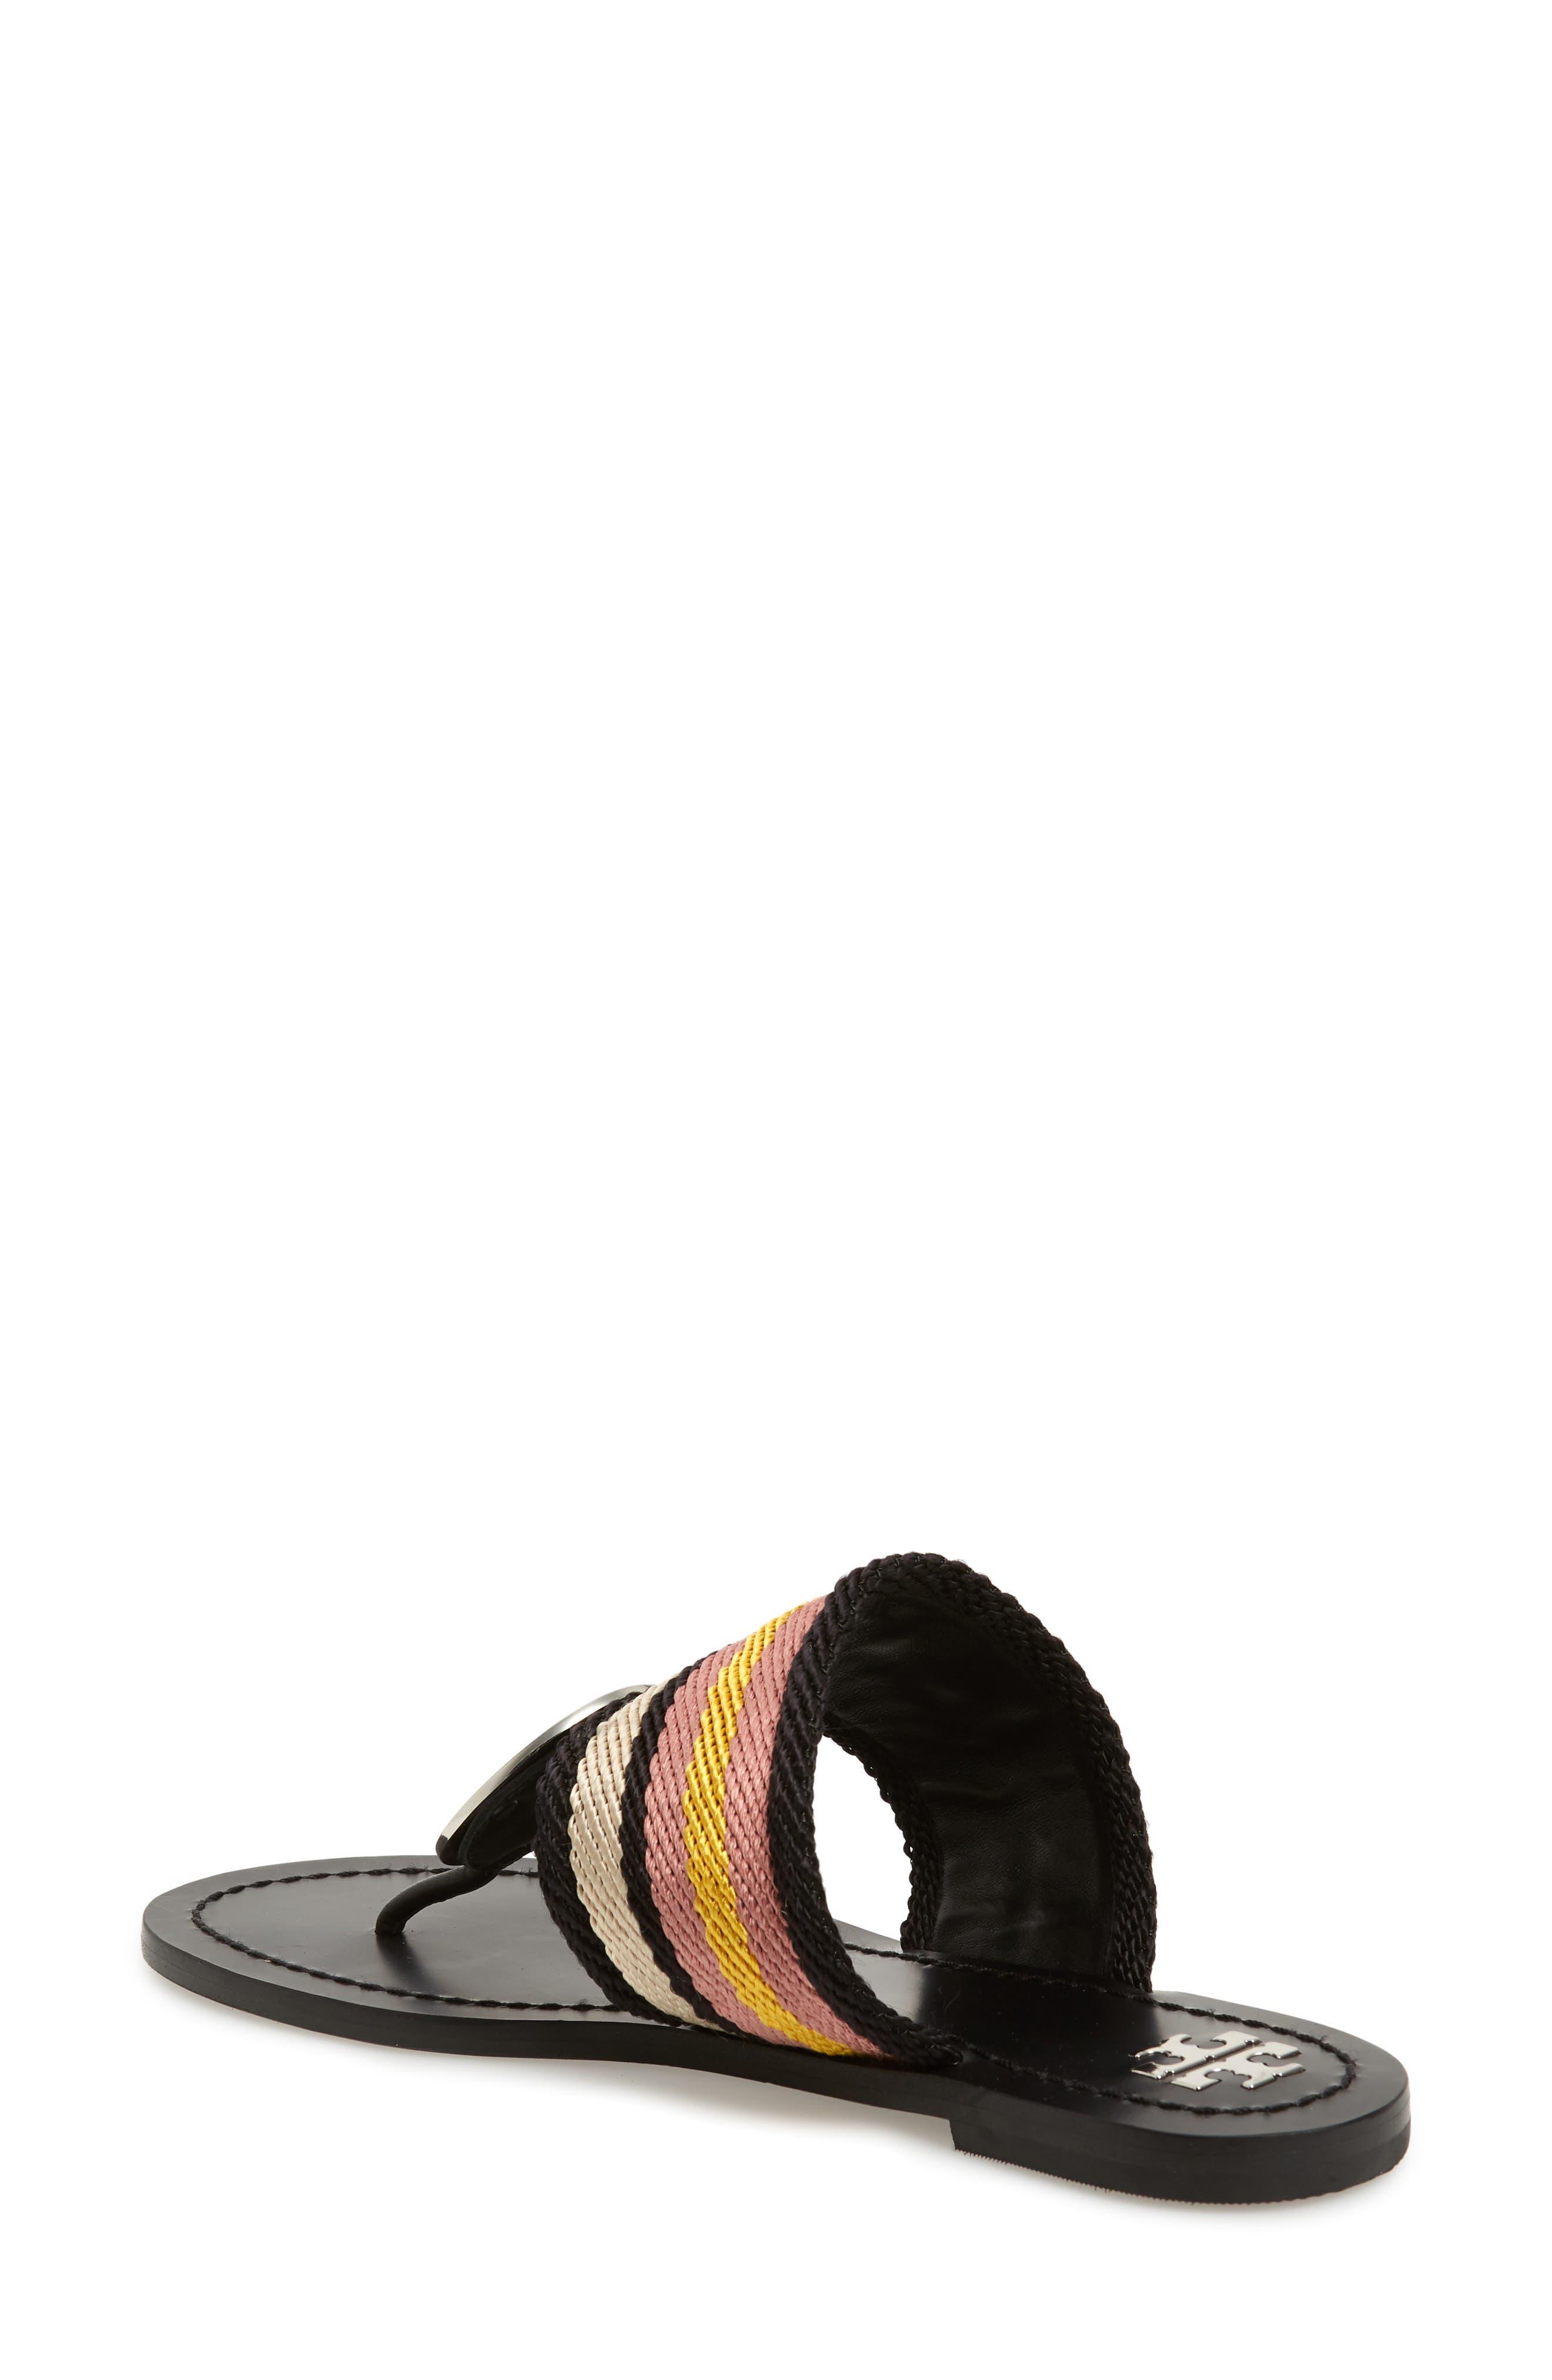 TORY BURCH,                             Patos Sandal,                             Alternate thumbnail 2, color,                             BLACK STRIPE/ PERFECT BLACK